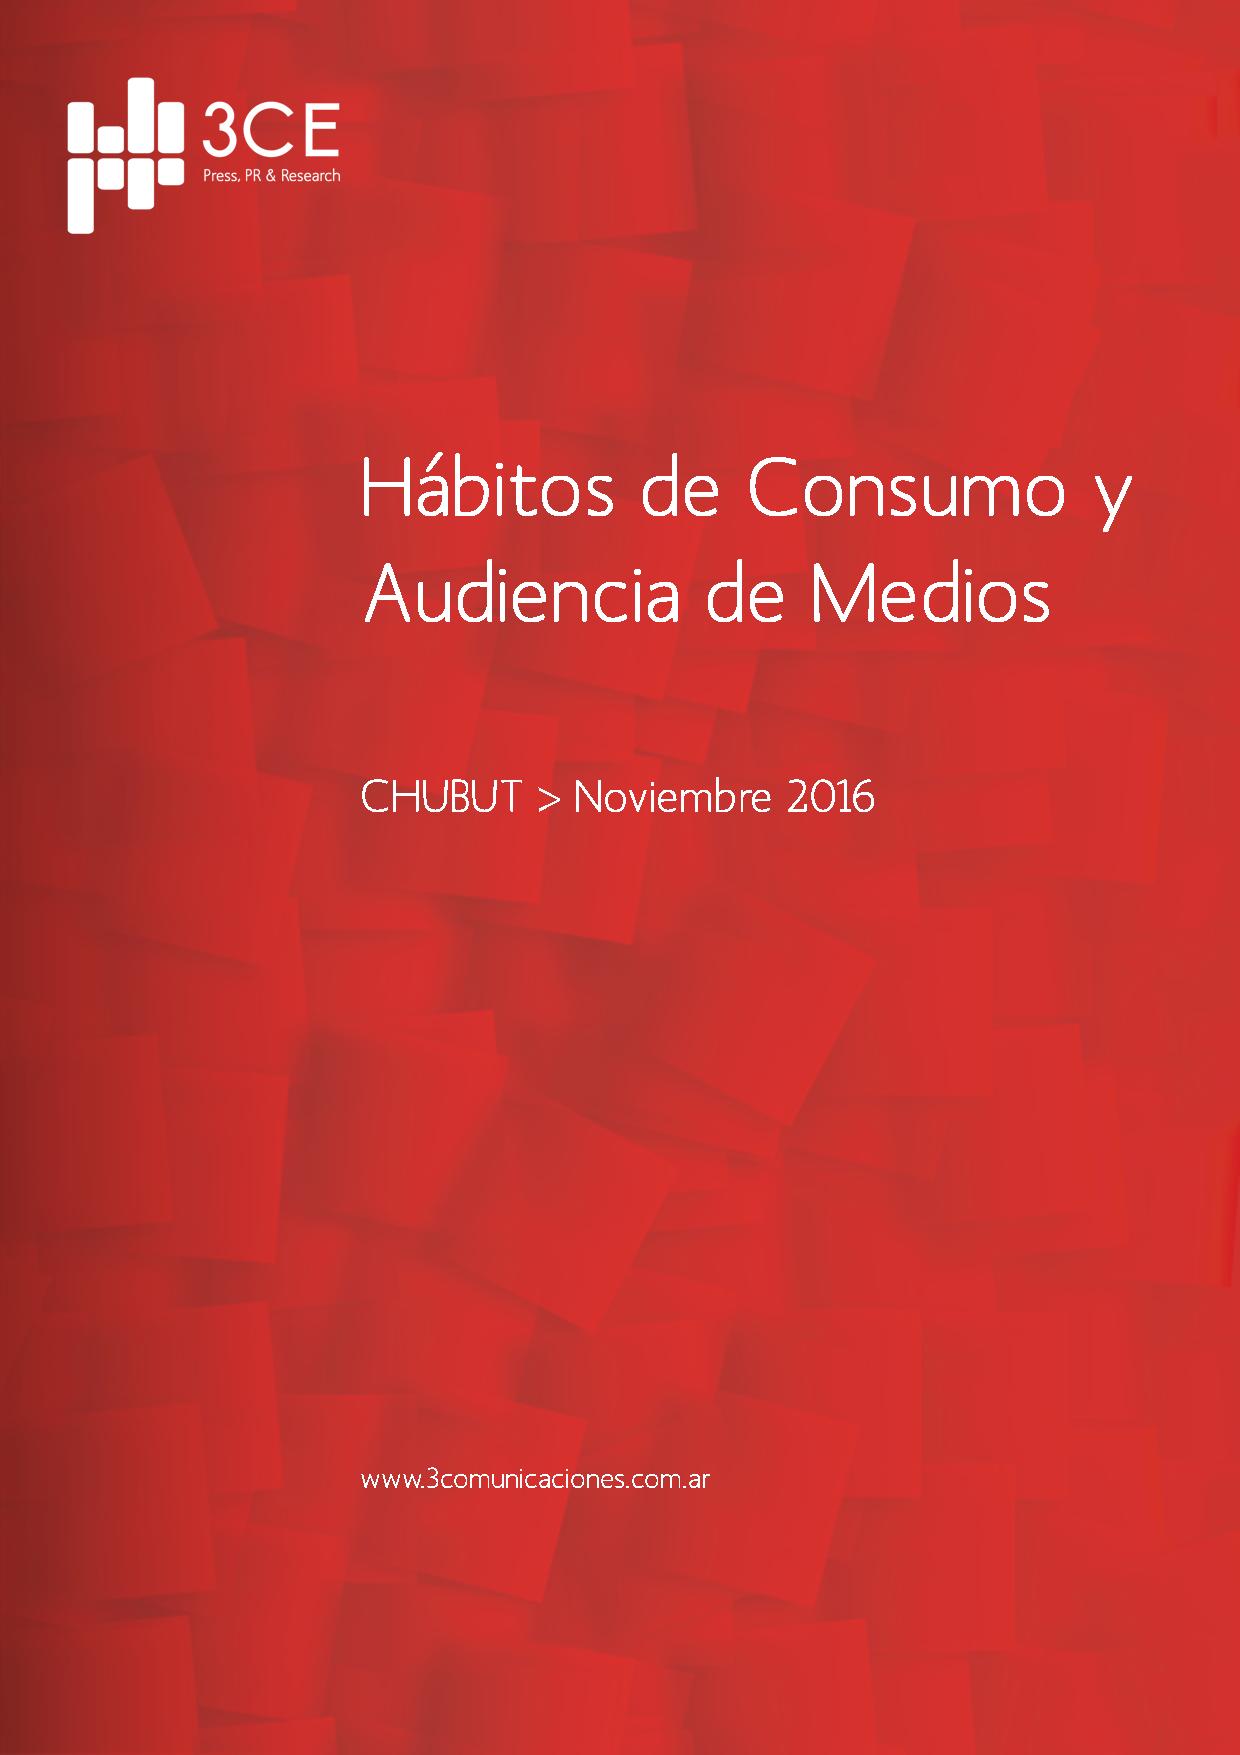 Consumo de medios en Chubut